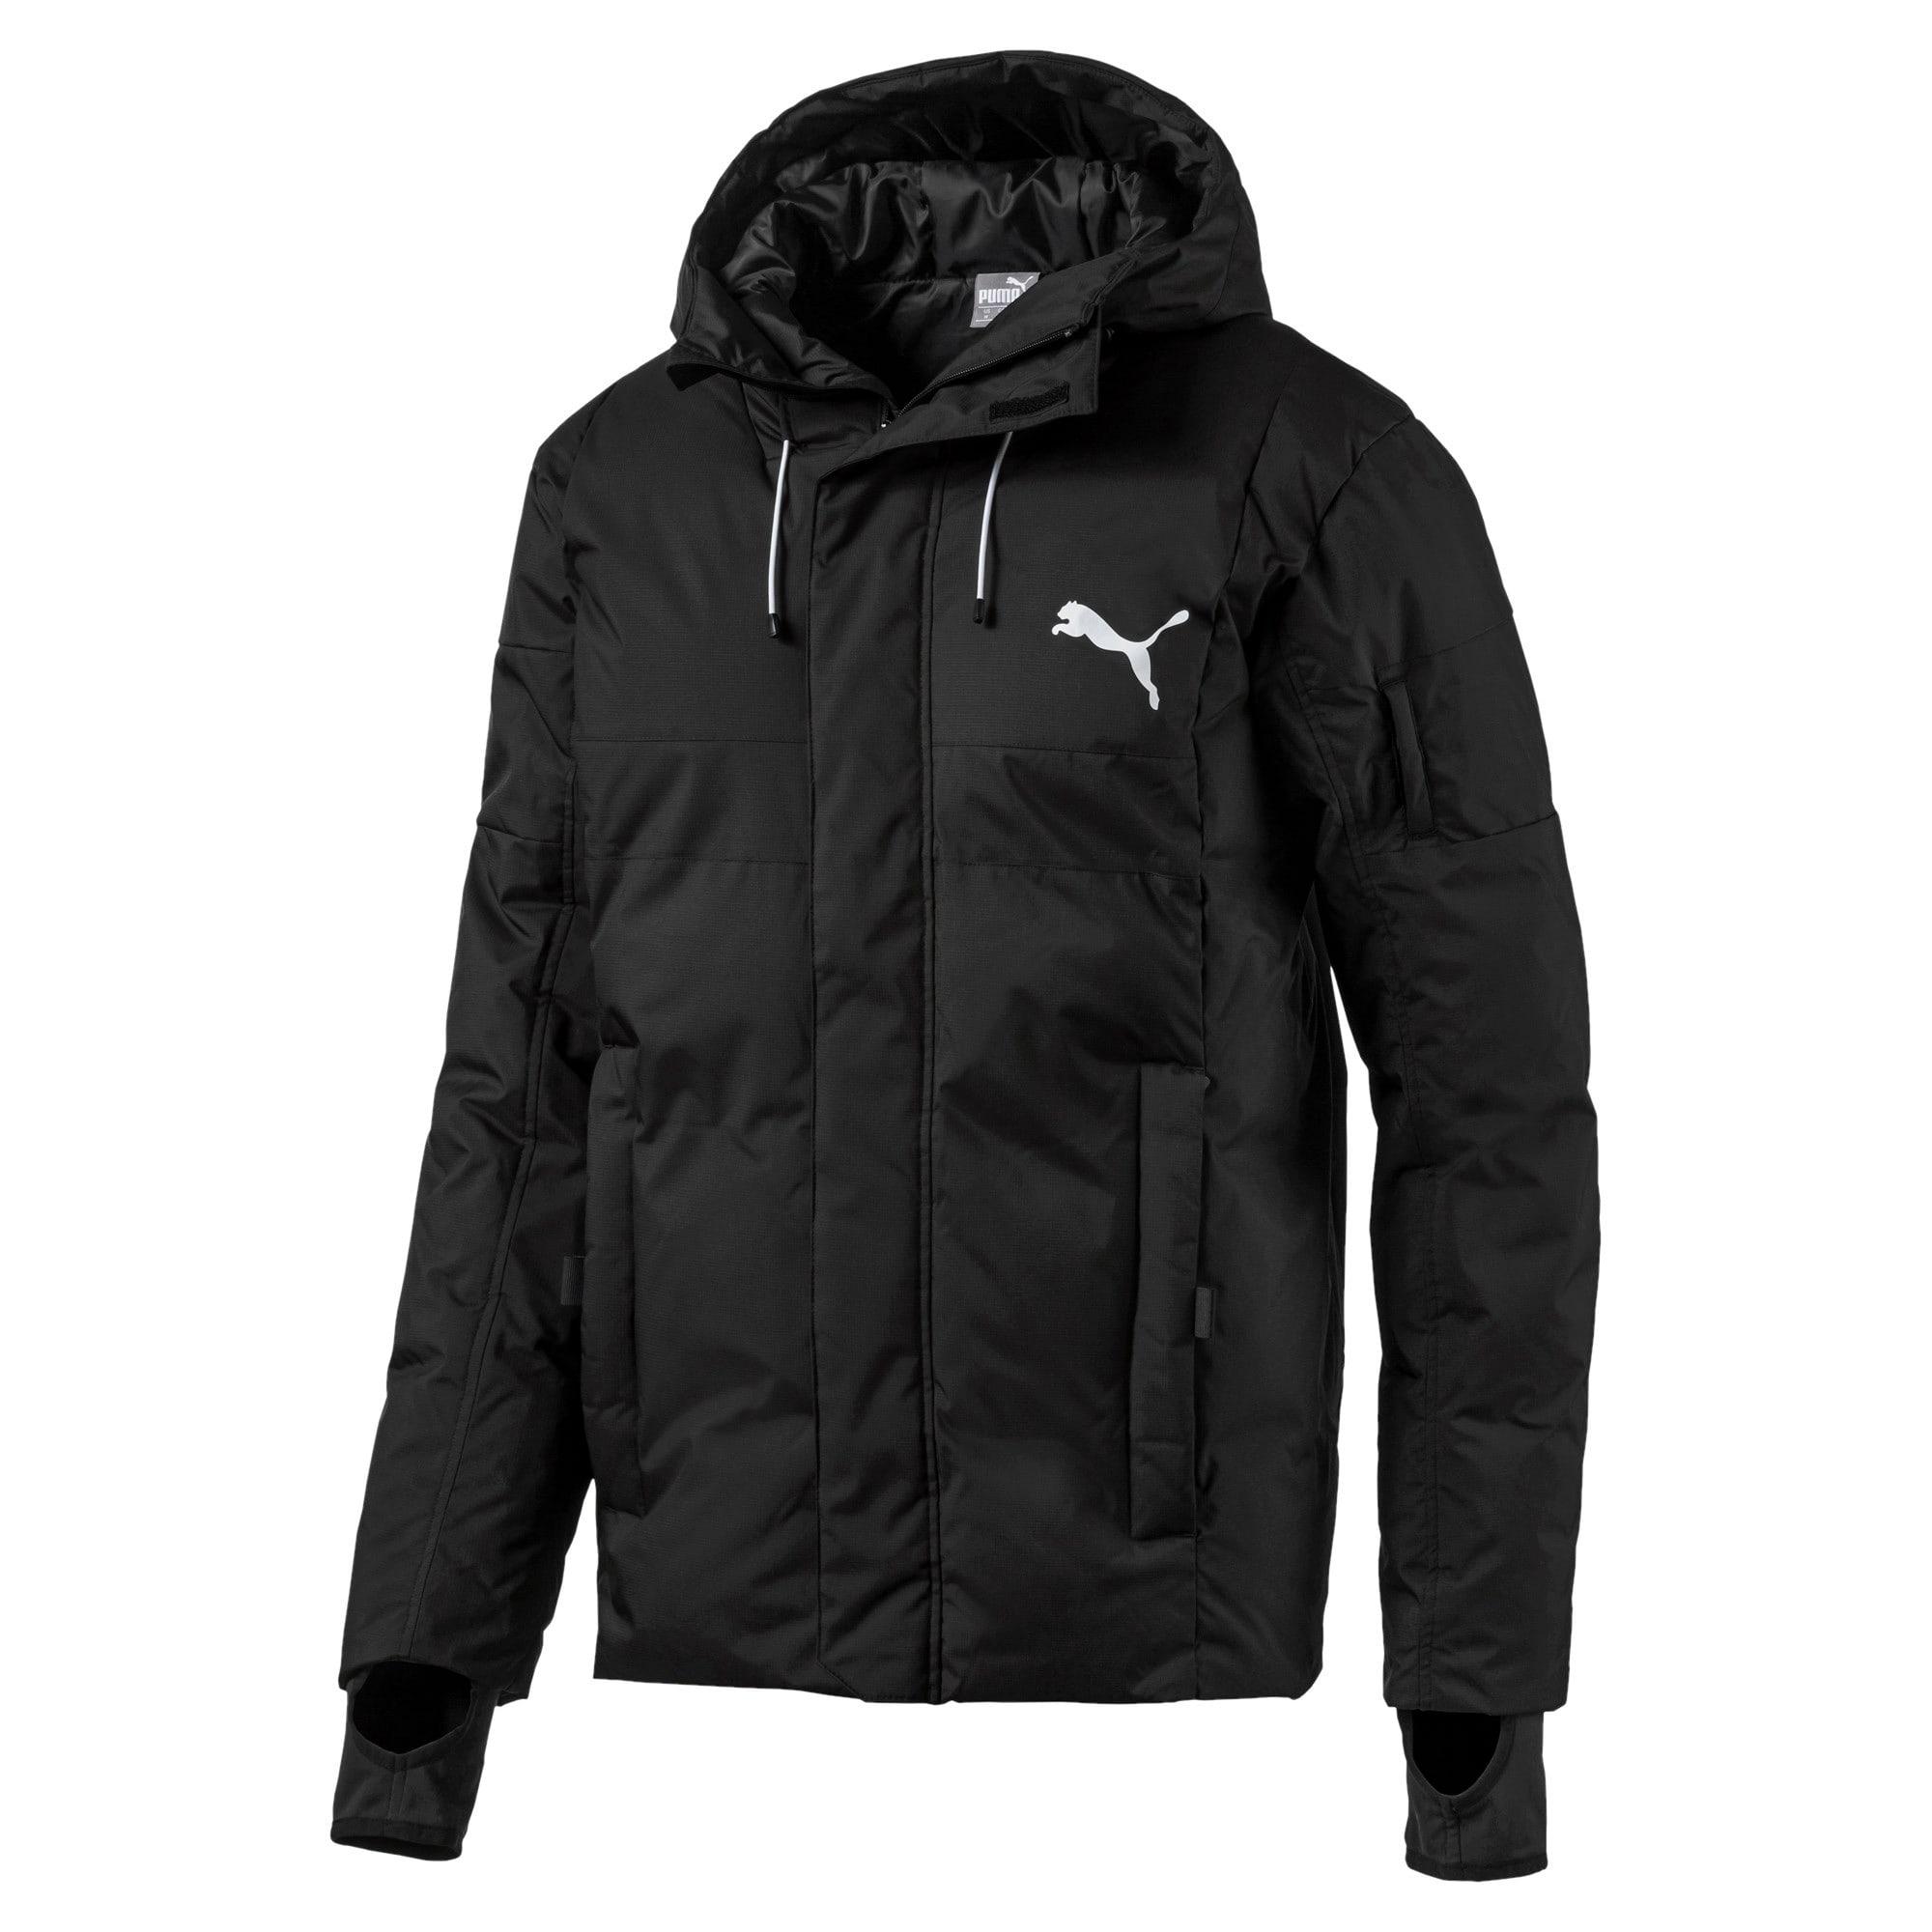 Thumbnail 4 of 650 Protective Down Men's Jacket, Puma Black, medium